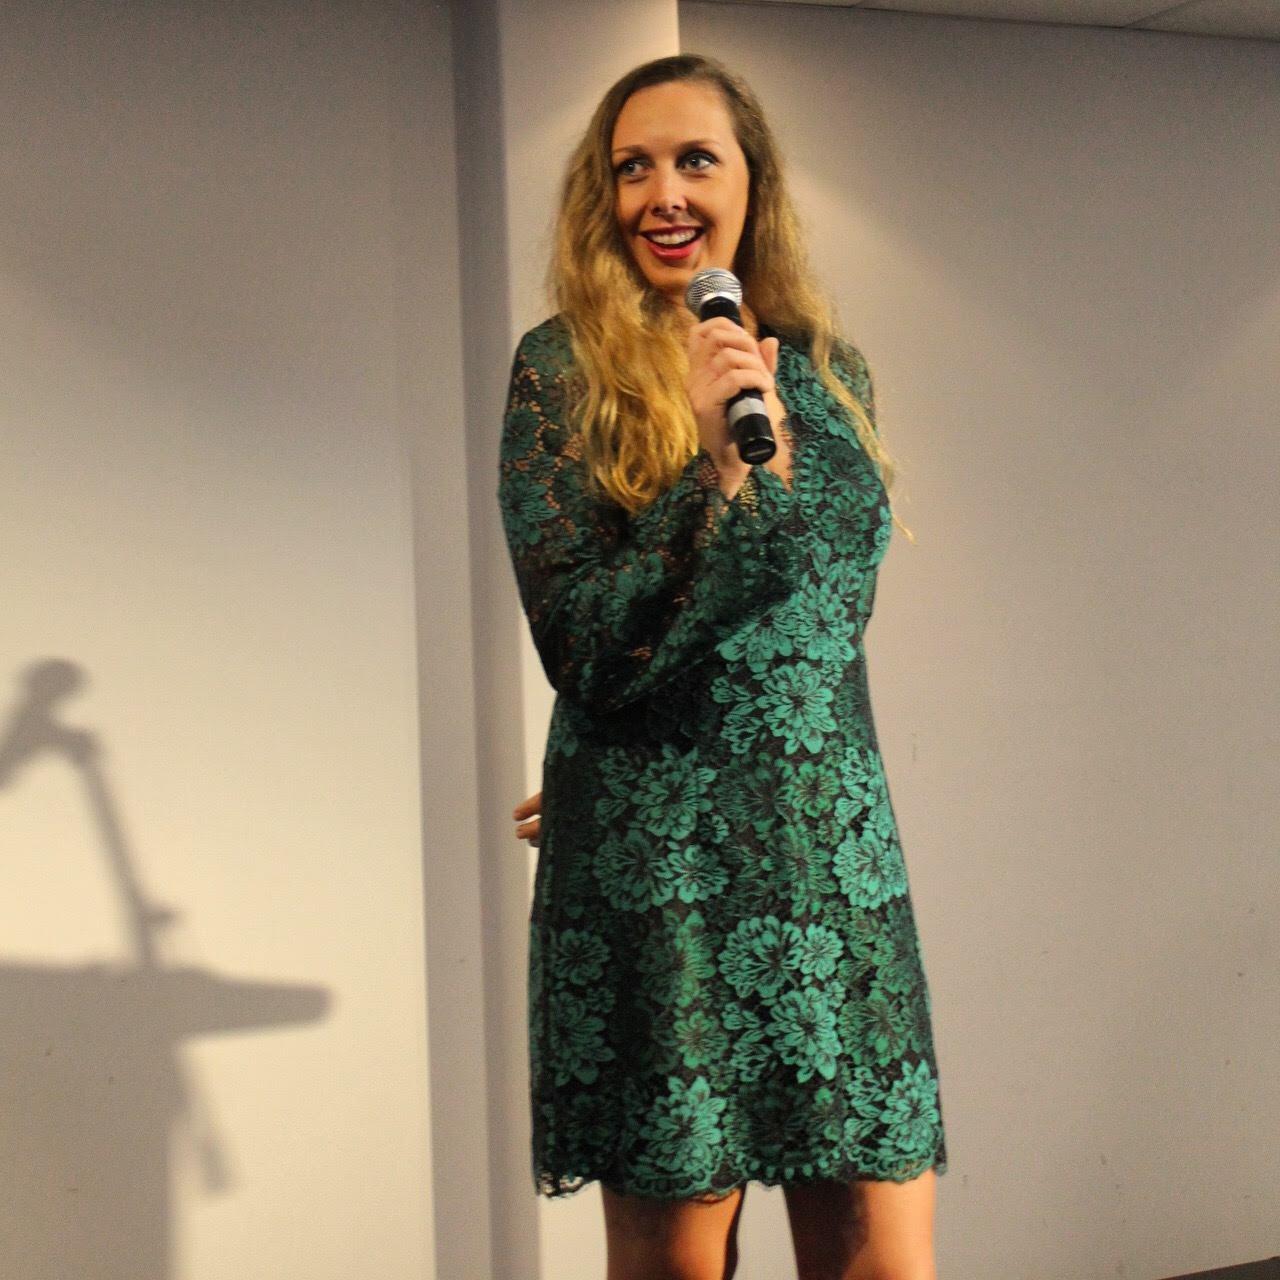 Emma Lovell Speaker, Writer and Personal Branding Specialist